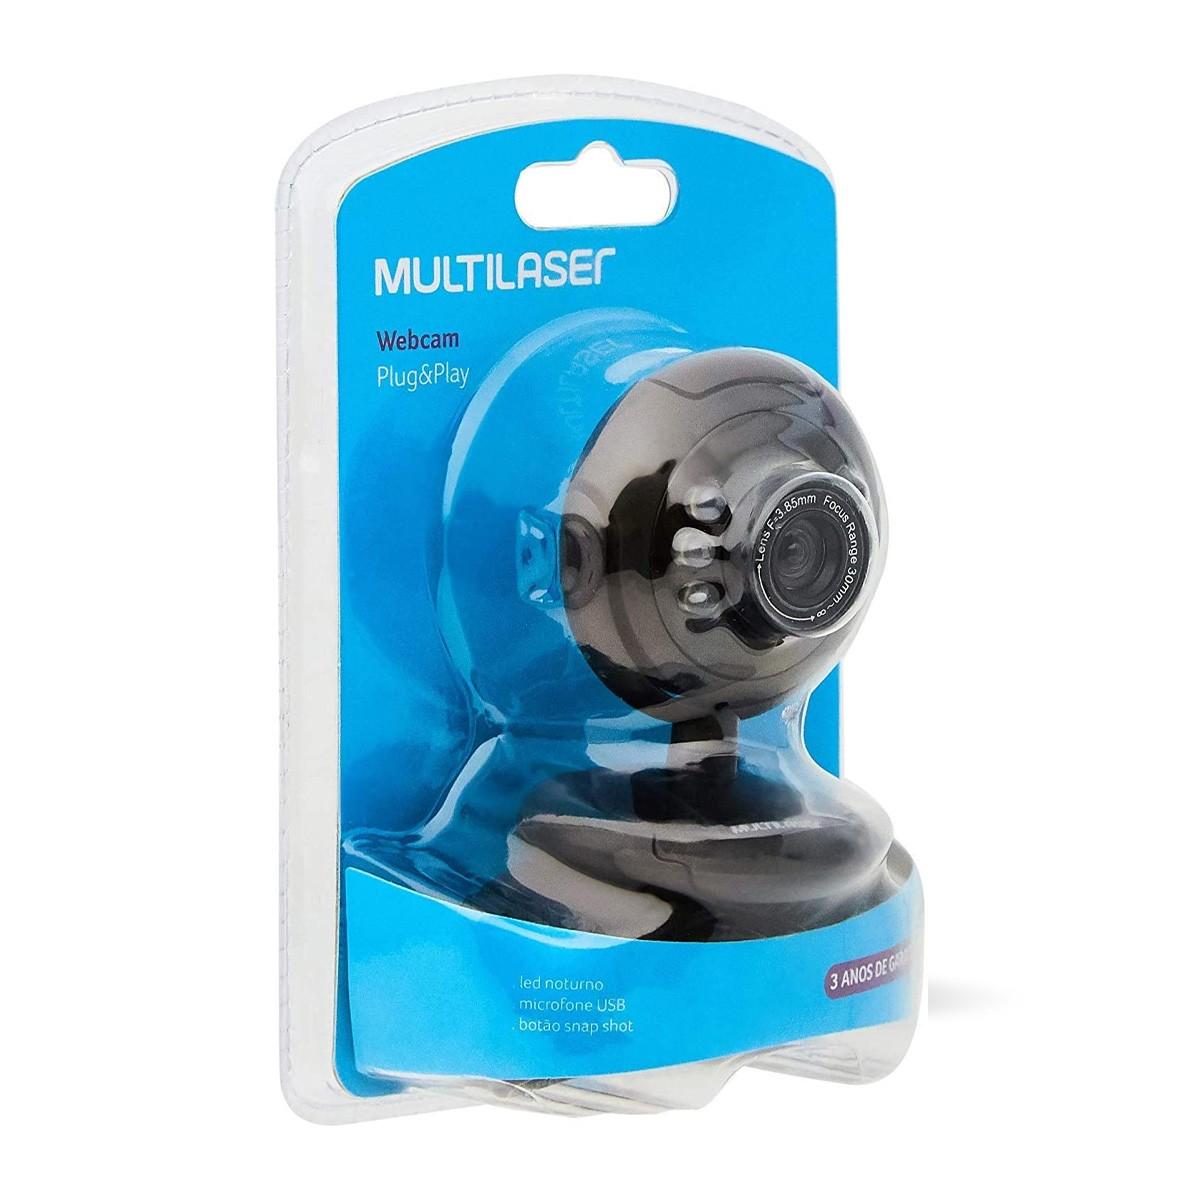 Webcam Multilaser Night Vision 16mp Iluminação Noturna Wc045